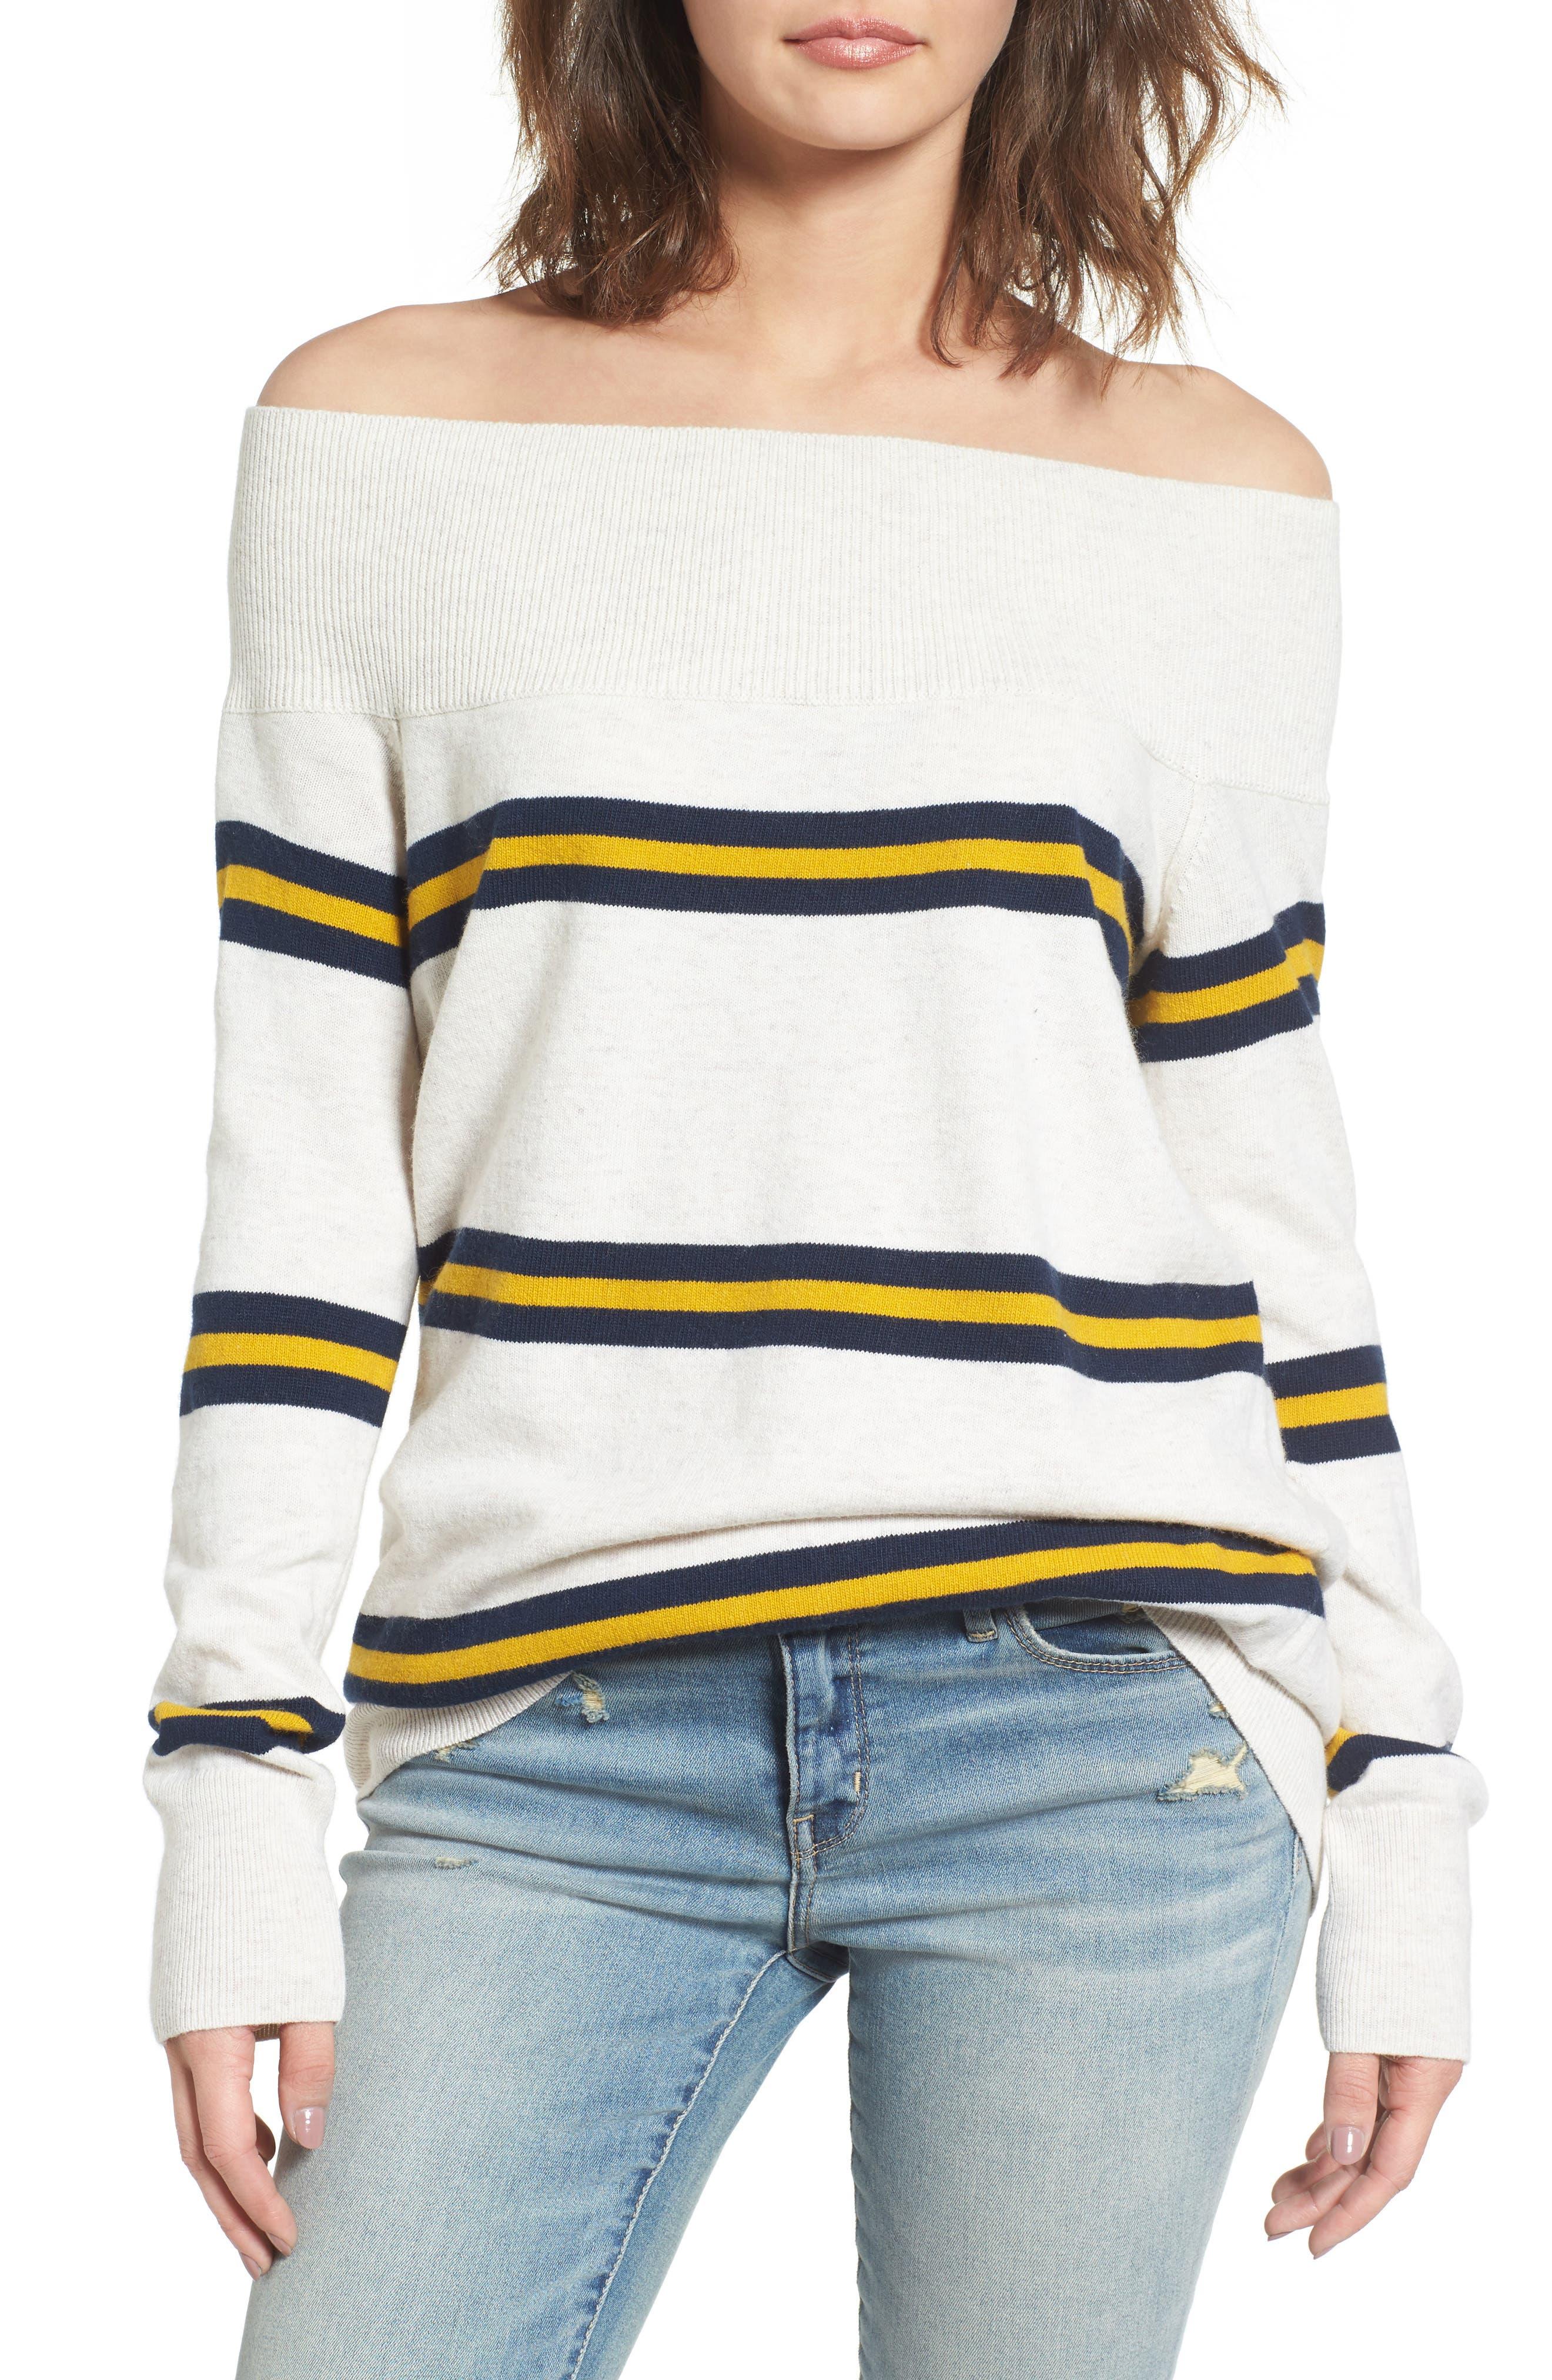 Alternate Image 1 Selected - Treasure & Bond Off the Shoulder Sweater